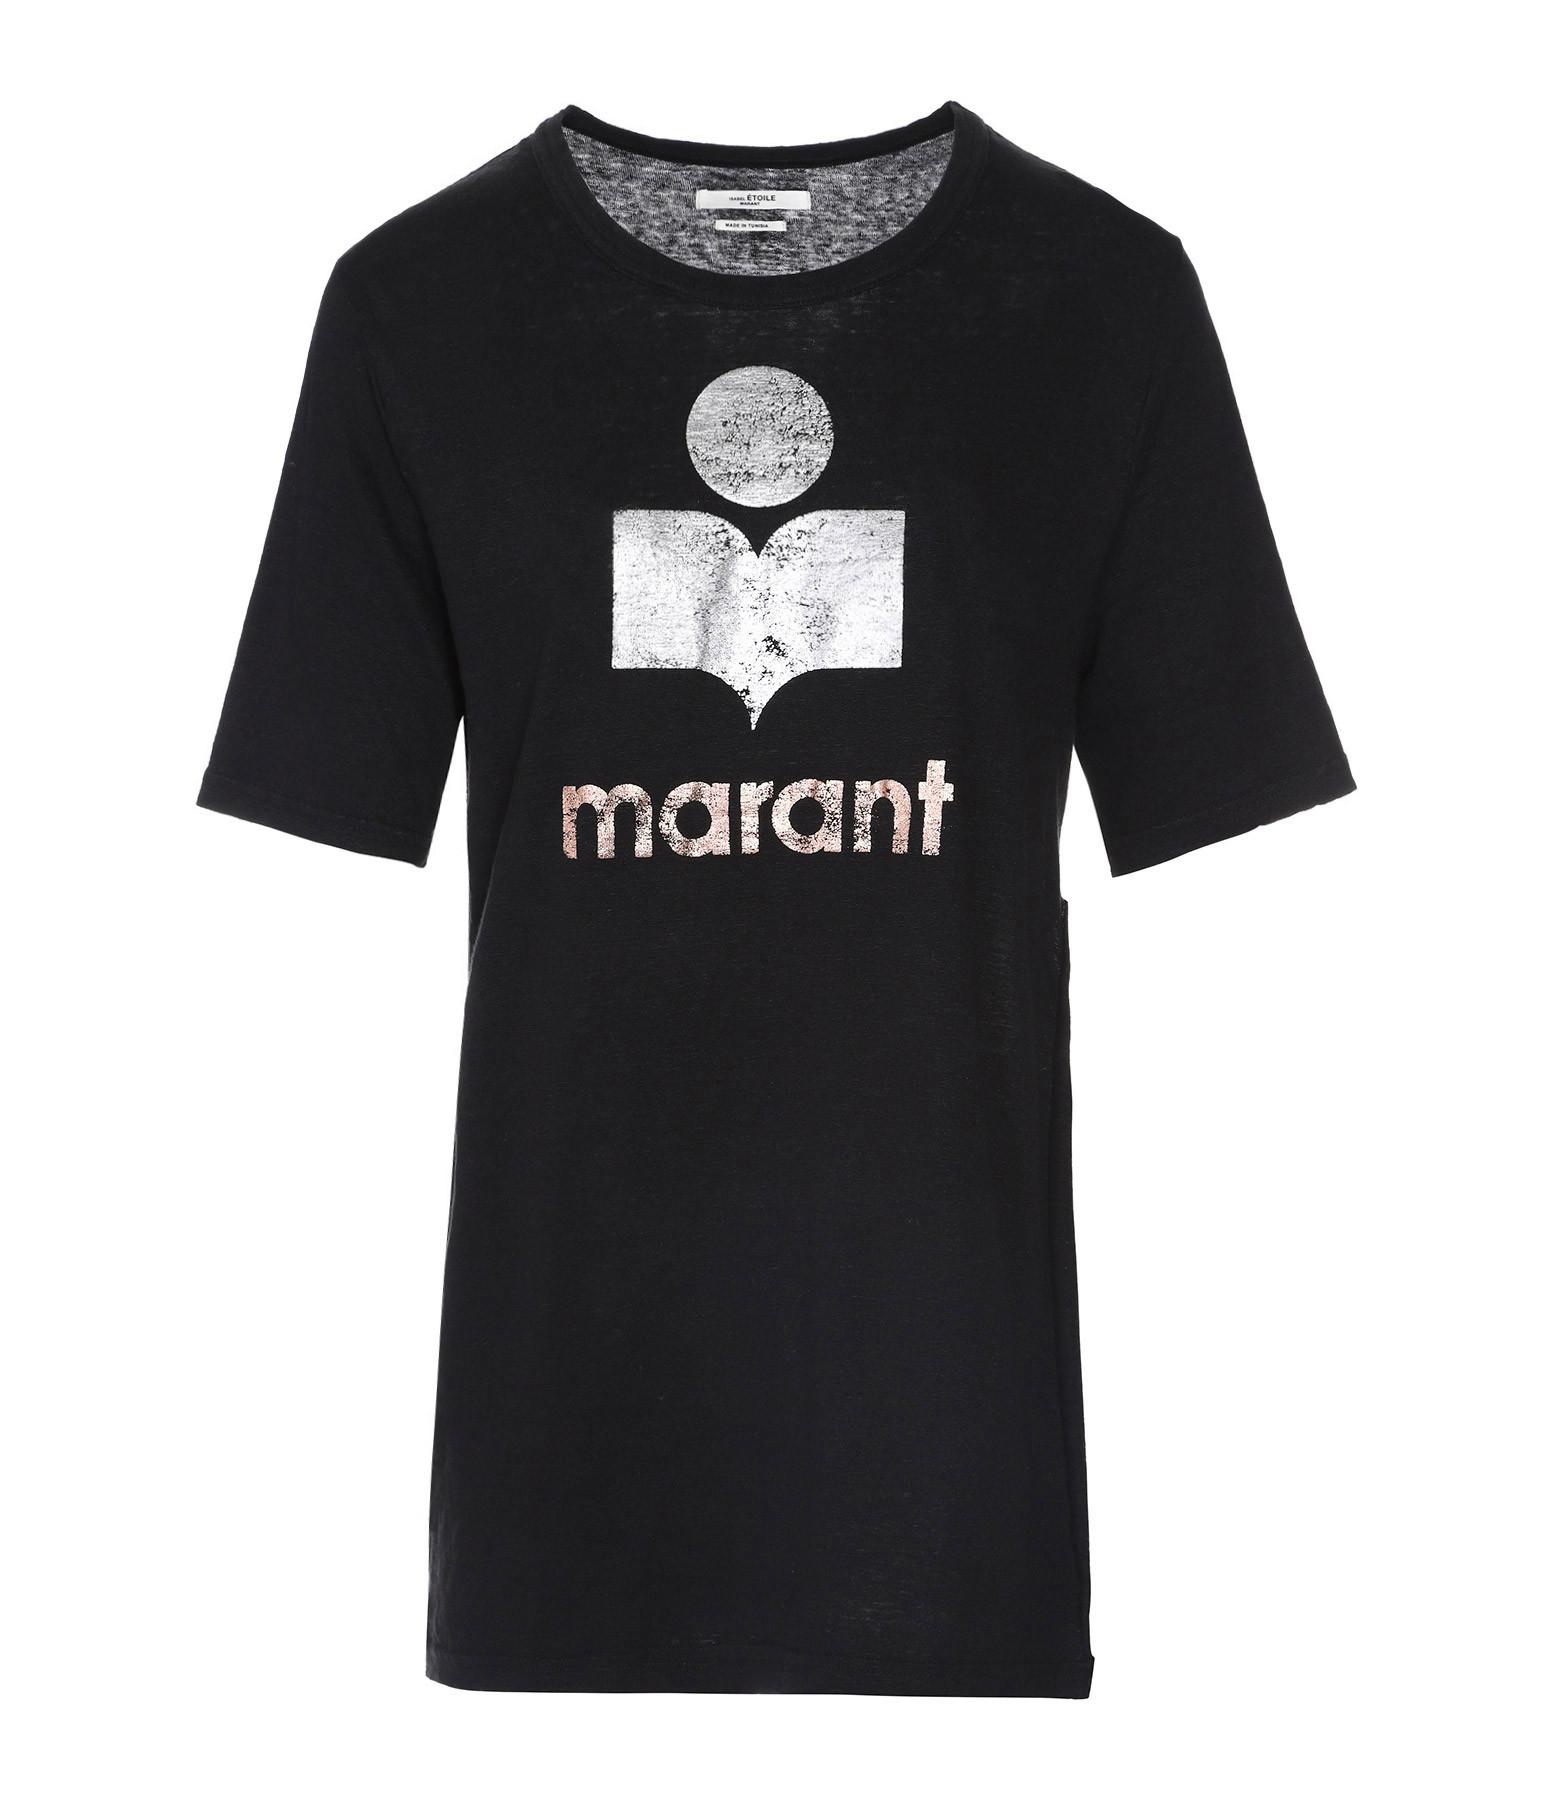 ISABEL MARANT ÉTOILE - Tee-shirt Kuta Coton Noir